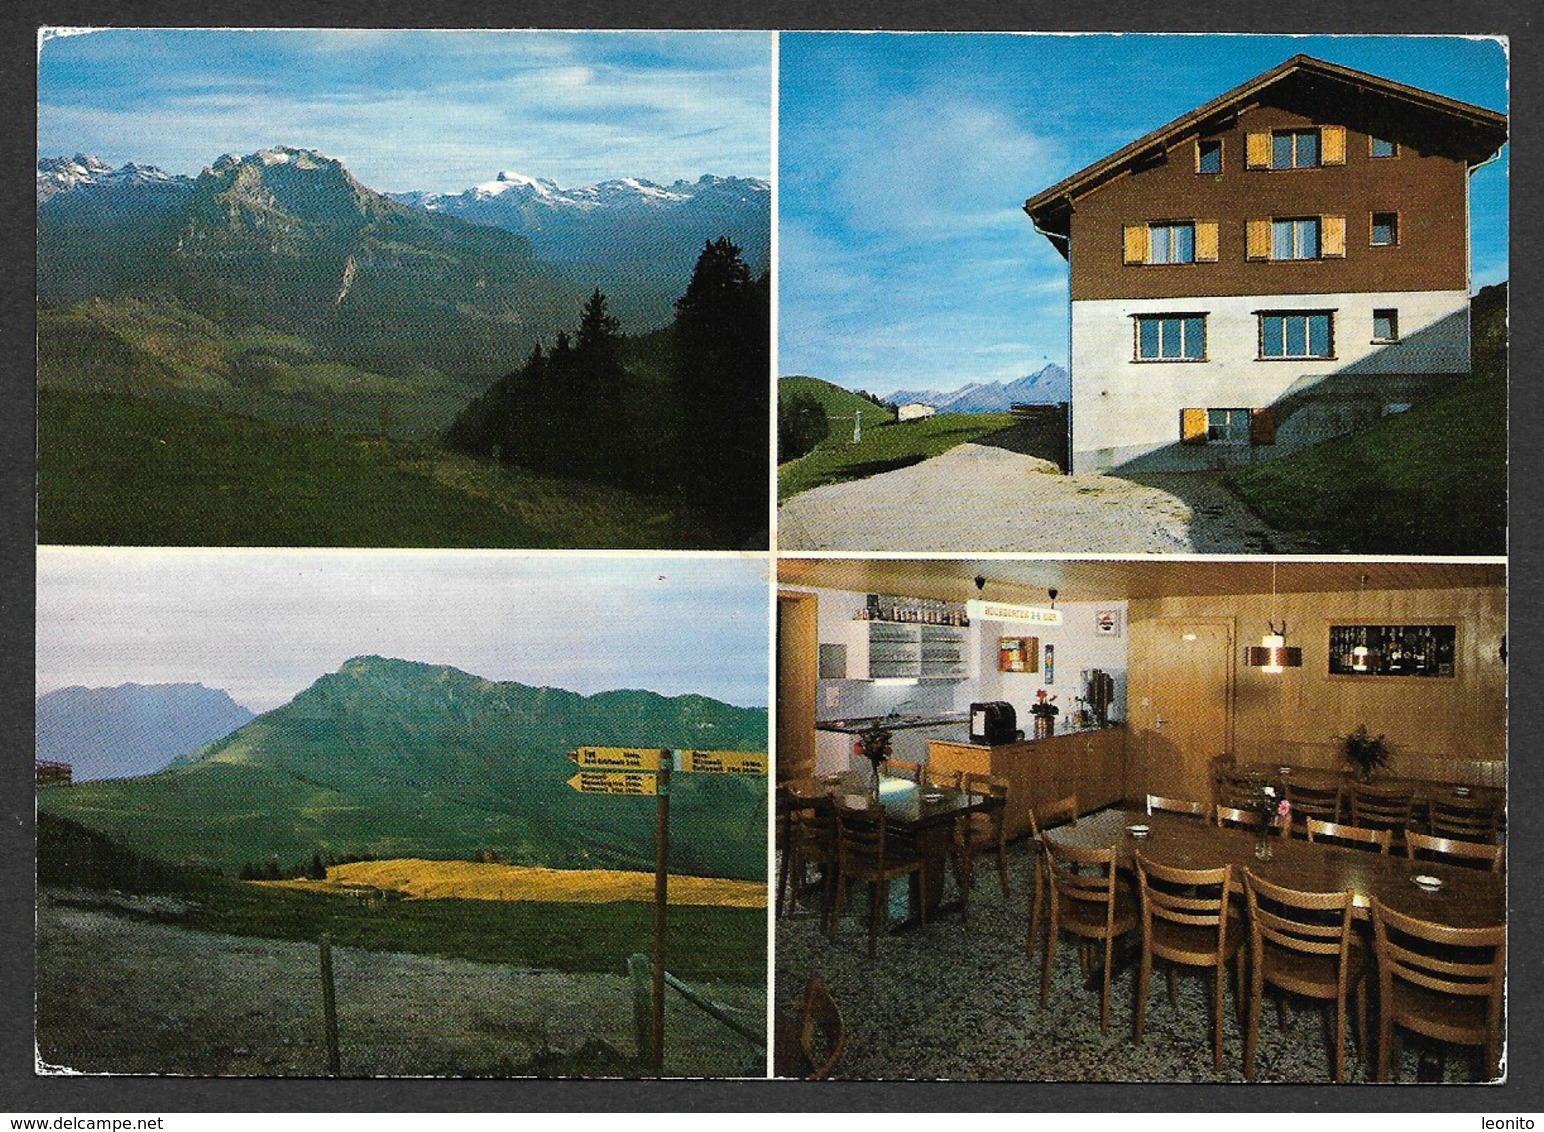 WIESENBERG NW Berggasthaus GUMMENALP Dallenwil - NW Nidwald